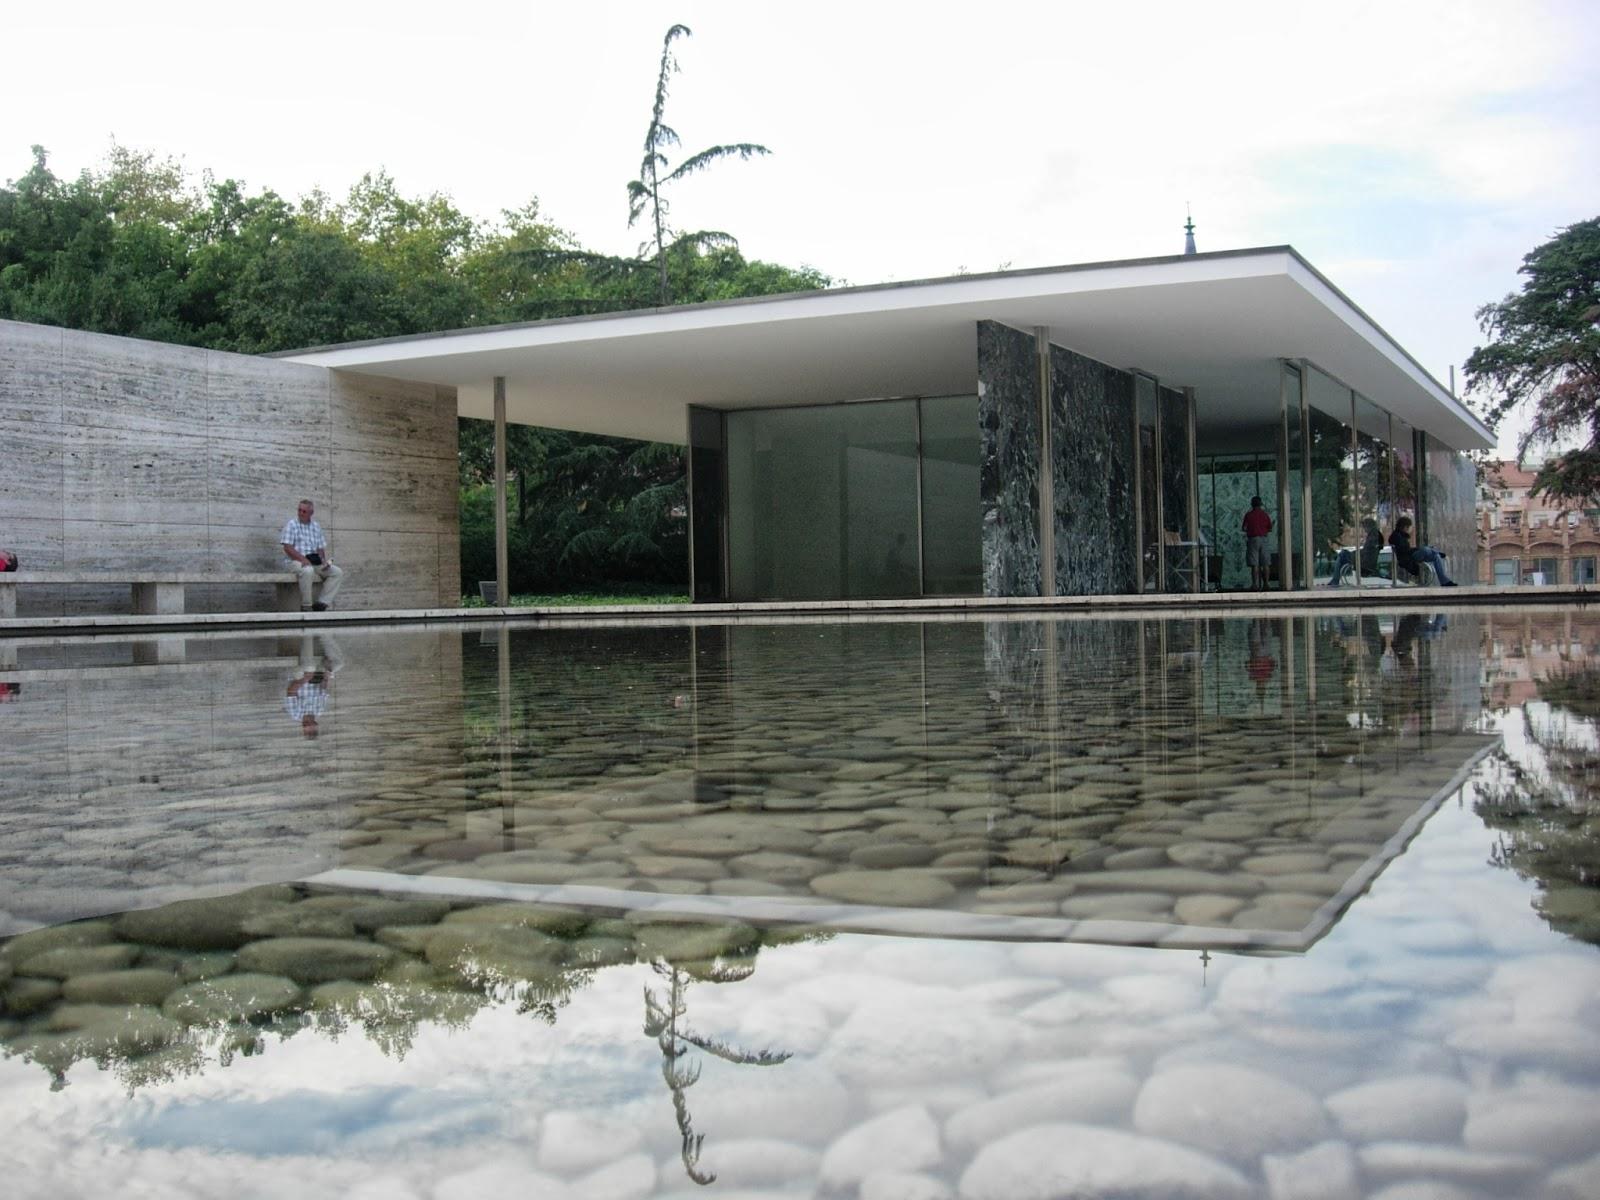 Barcelona pavilion exterior - Barcelona Pavilion Exterior 12